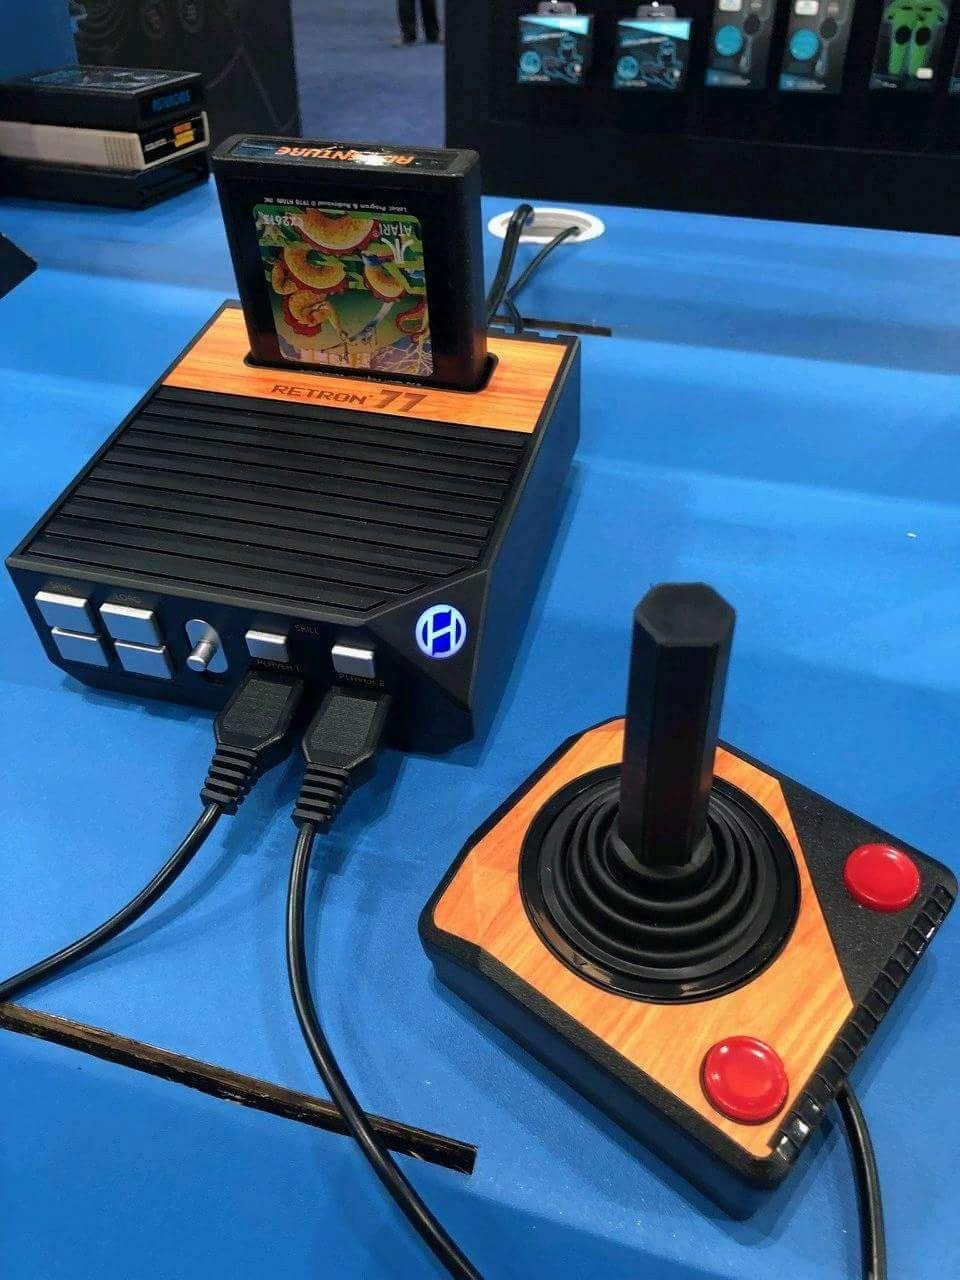 RetroN77 Retro arcade games, Computer video games, Retro